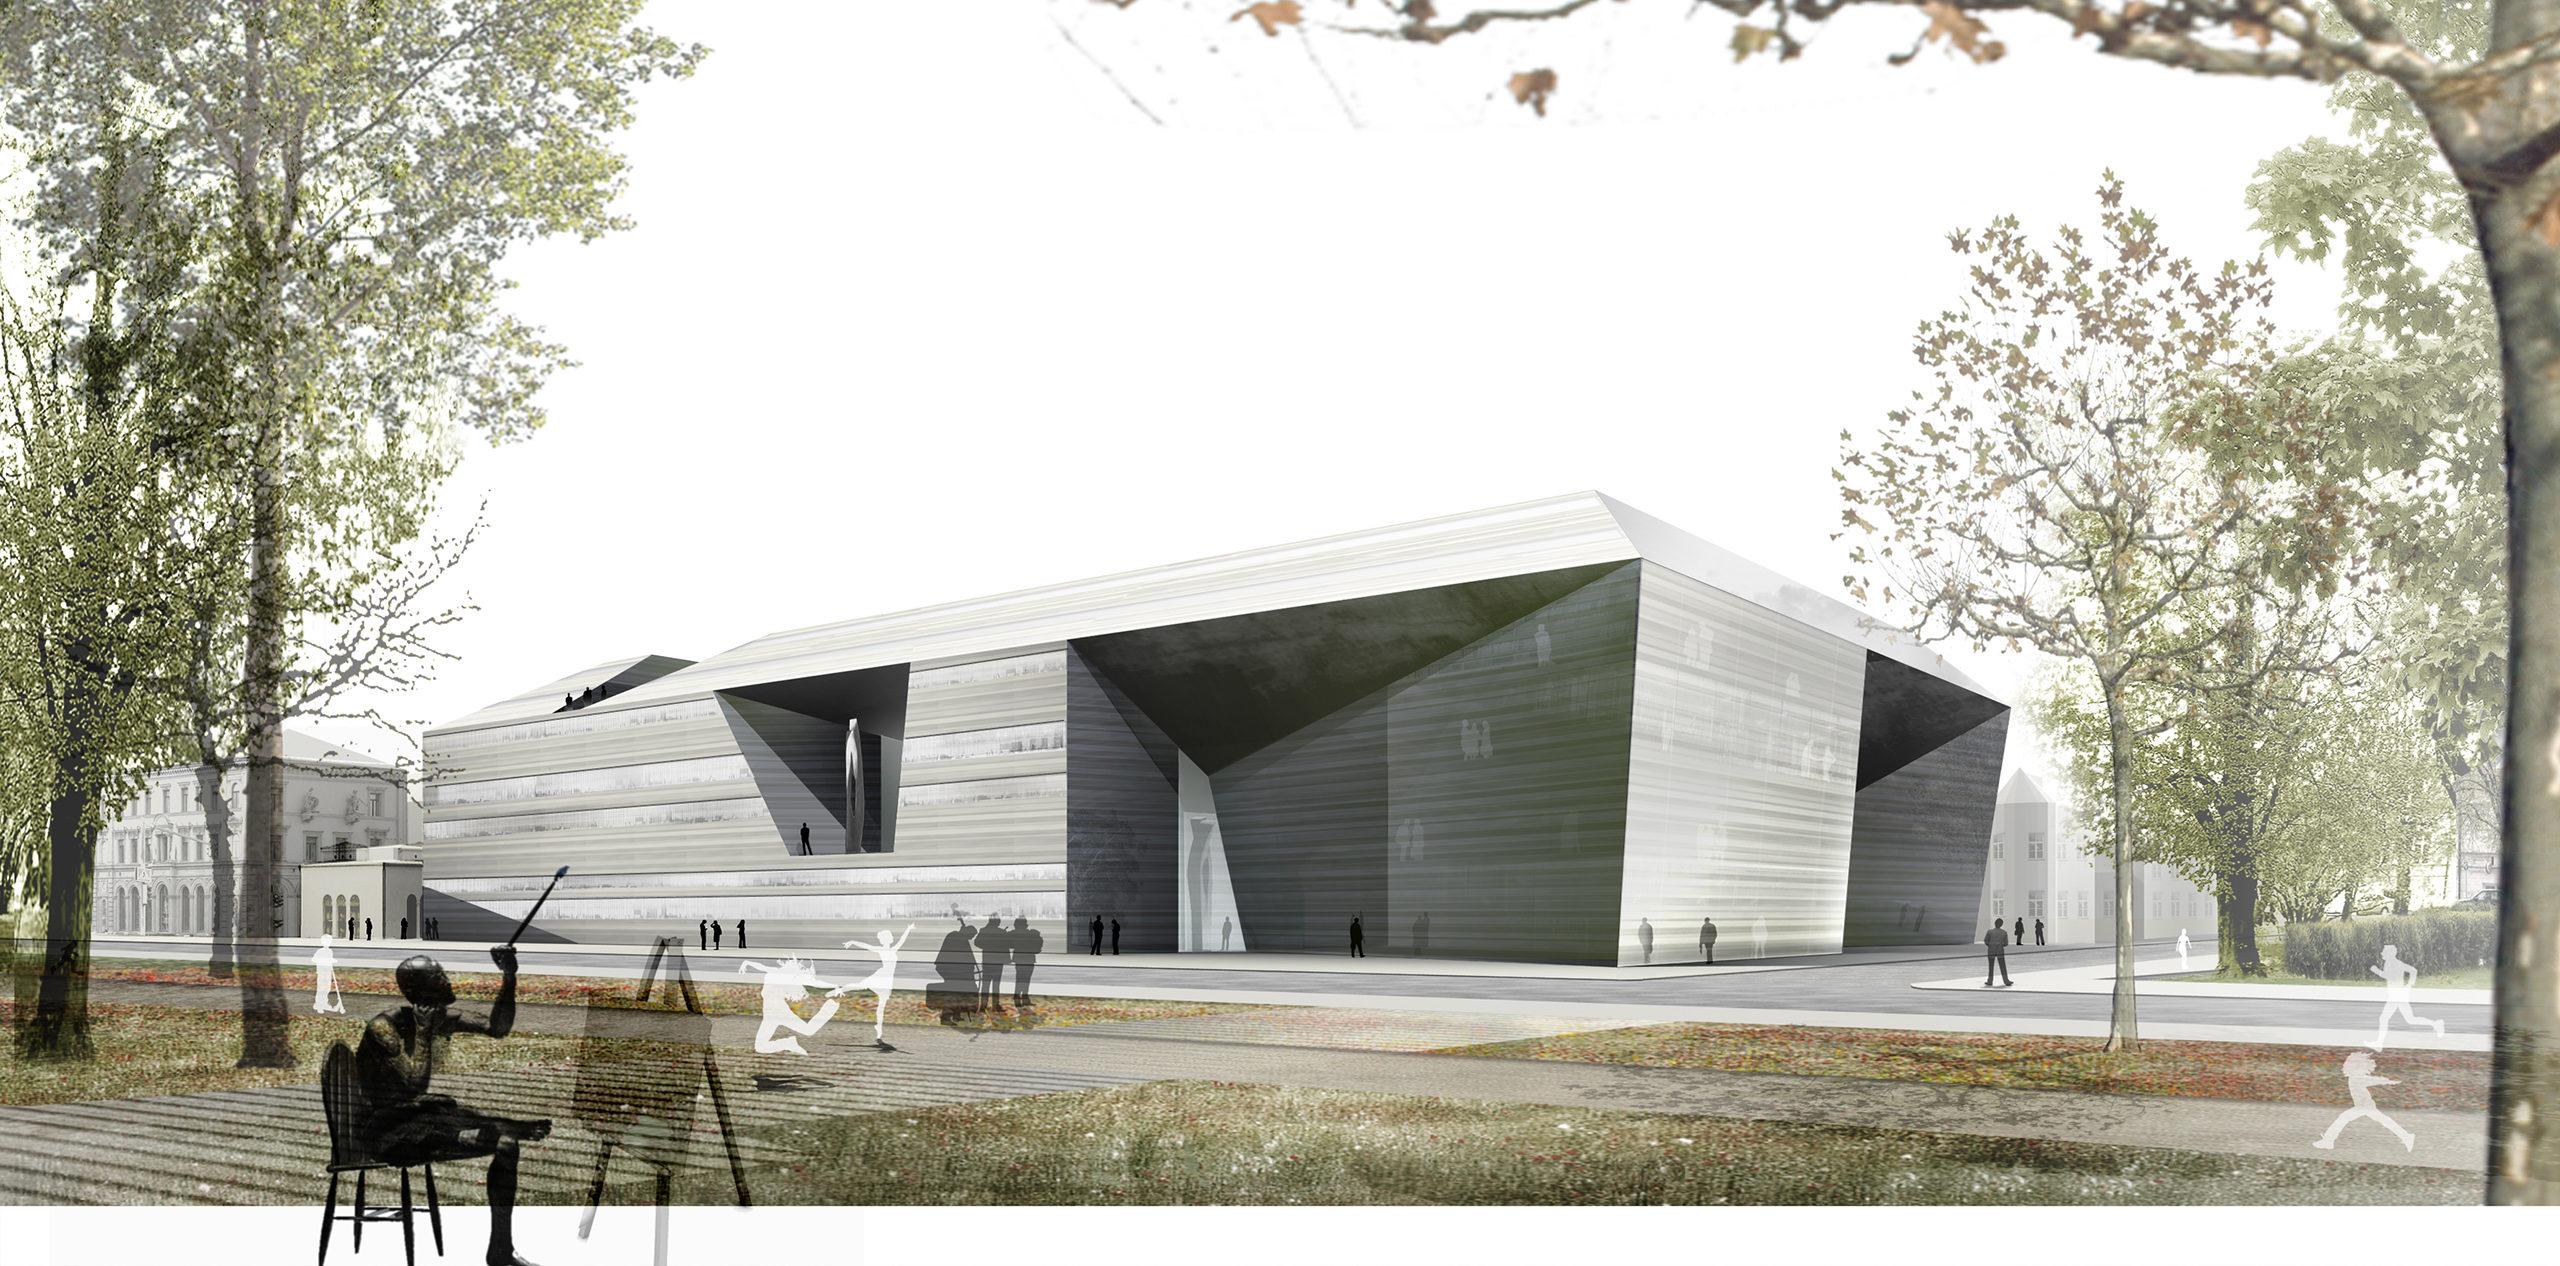 Tartu Library and Art Museum